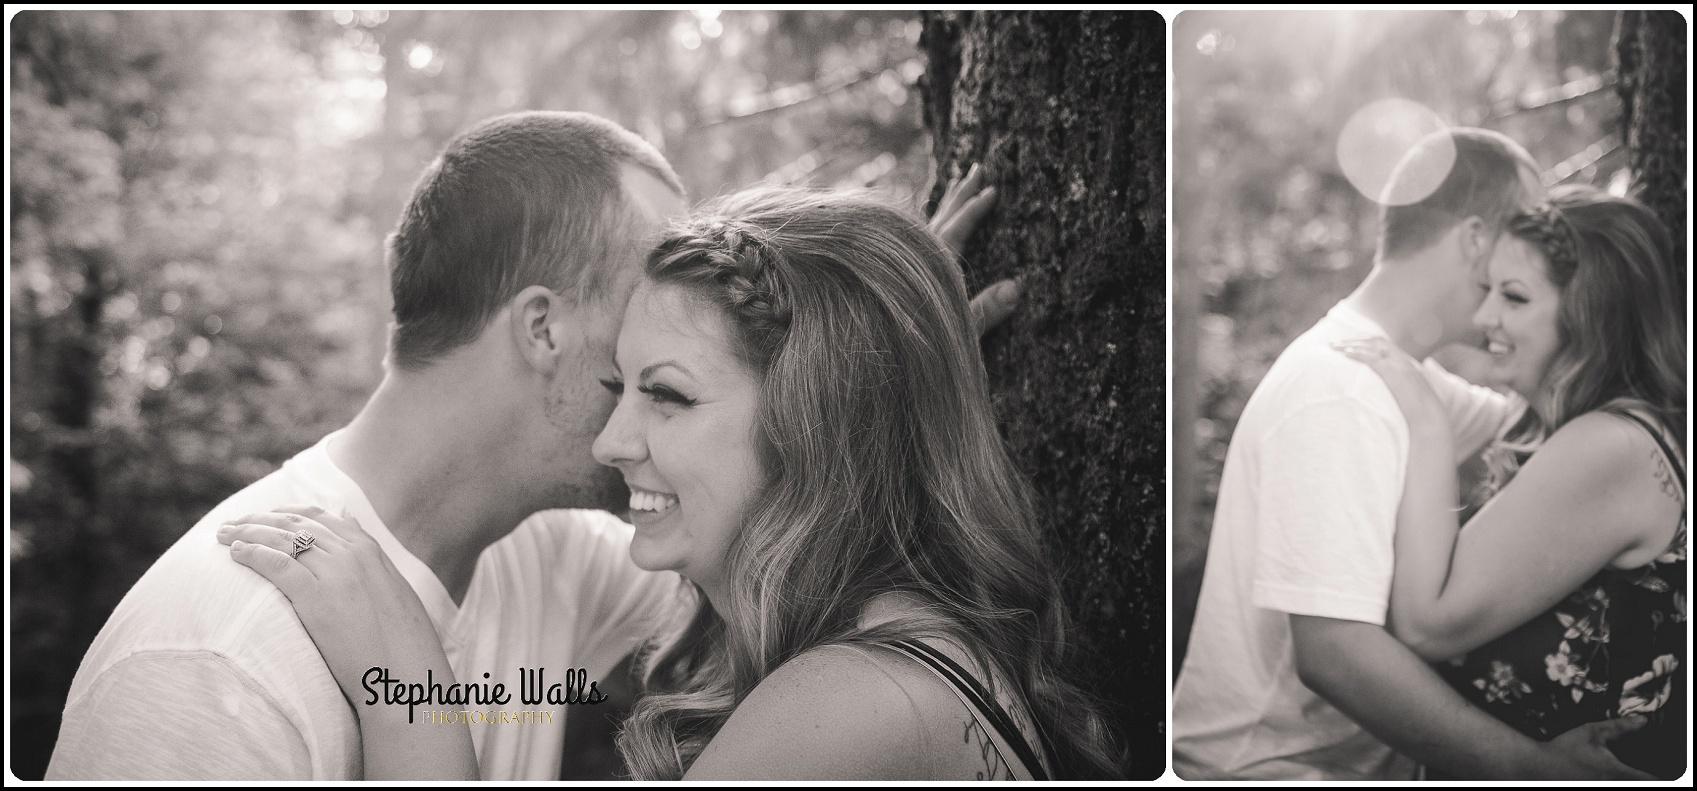 marissa   dustin005 Point Defiance Park Engagement with Marissa and Dustin